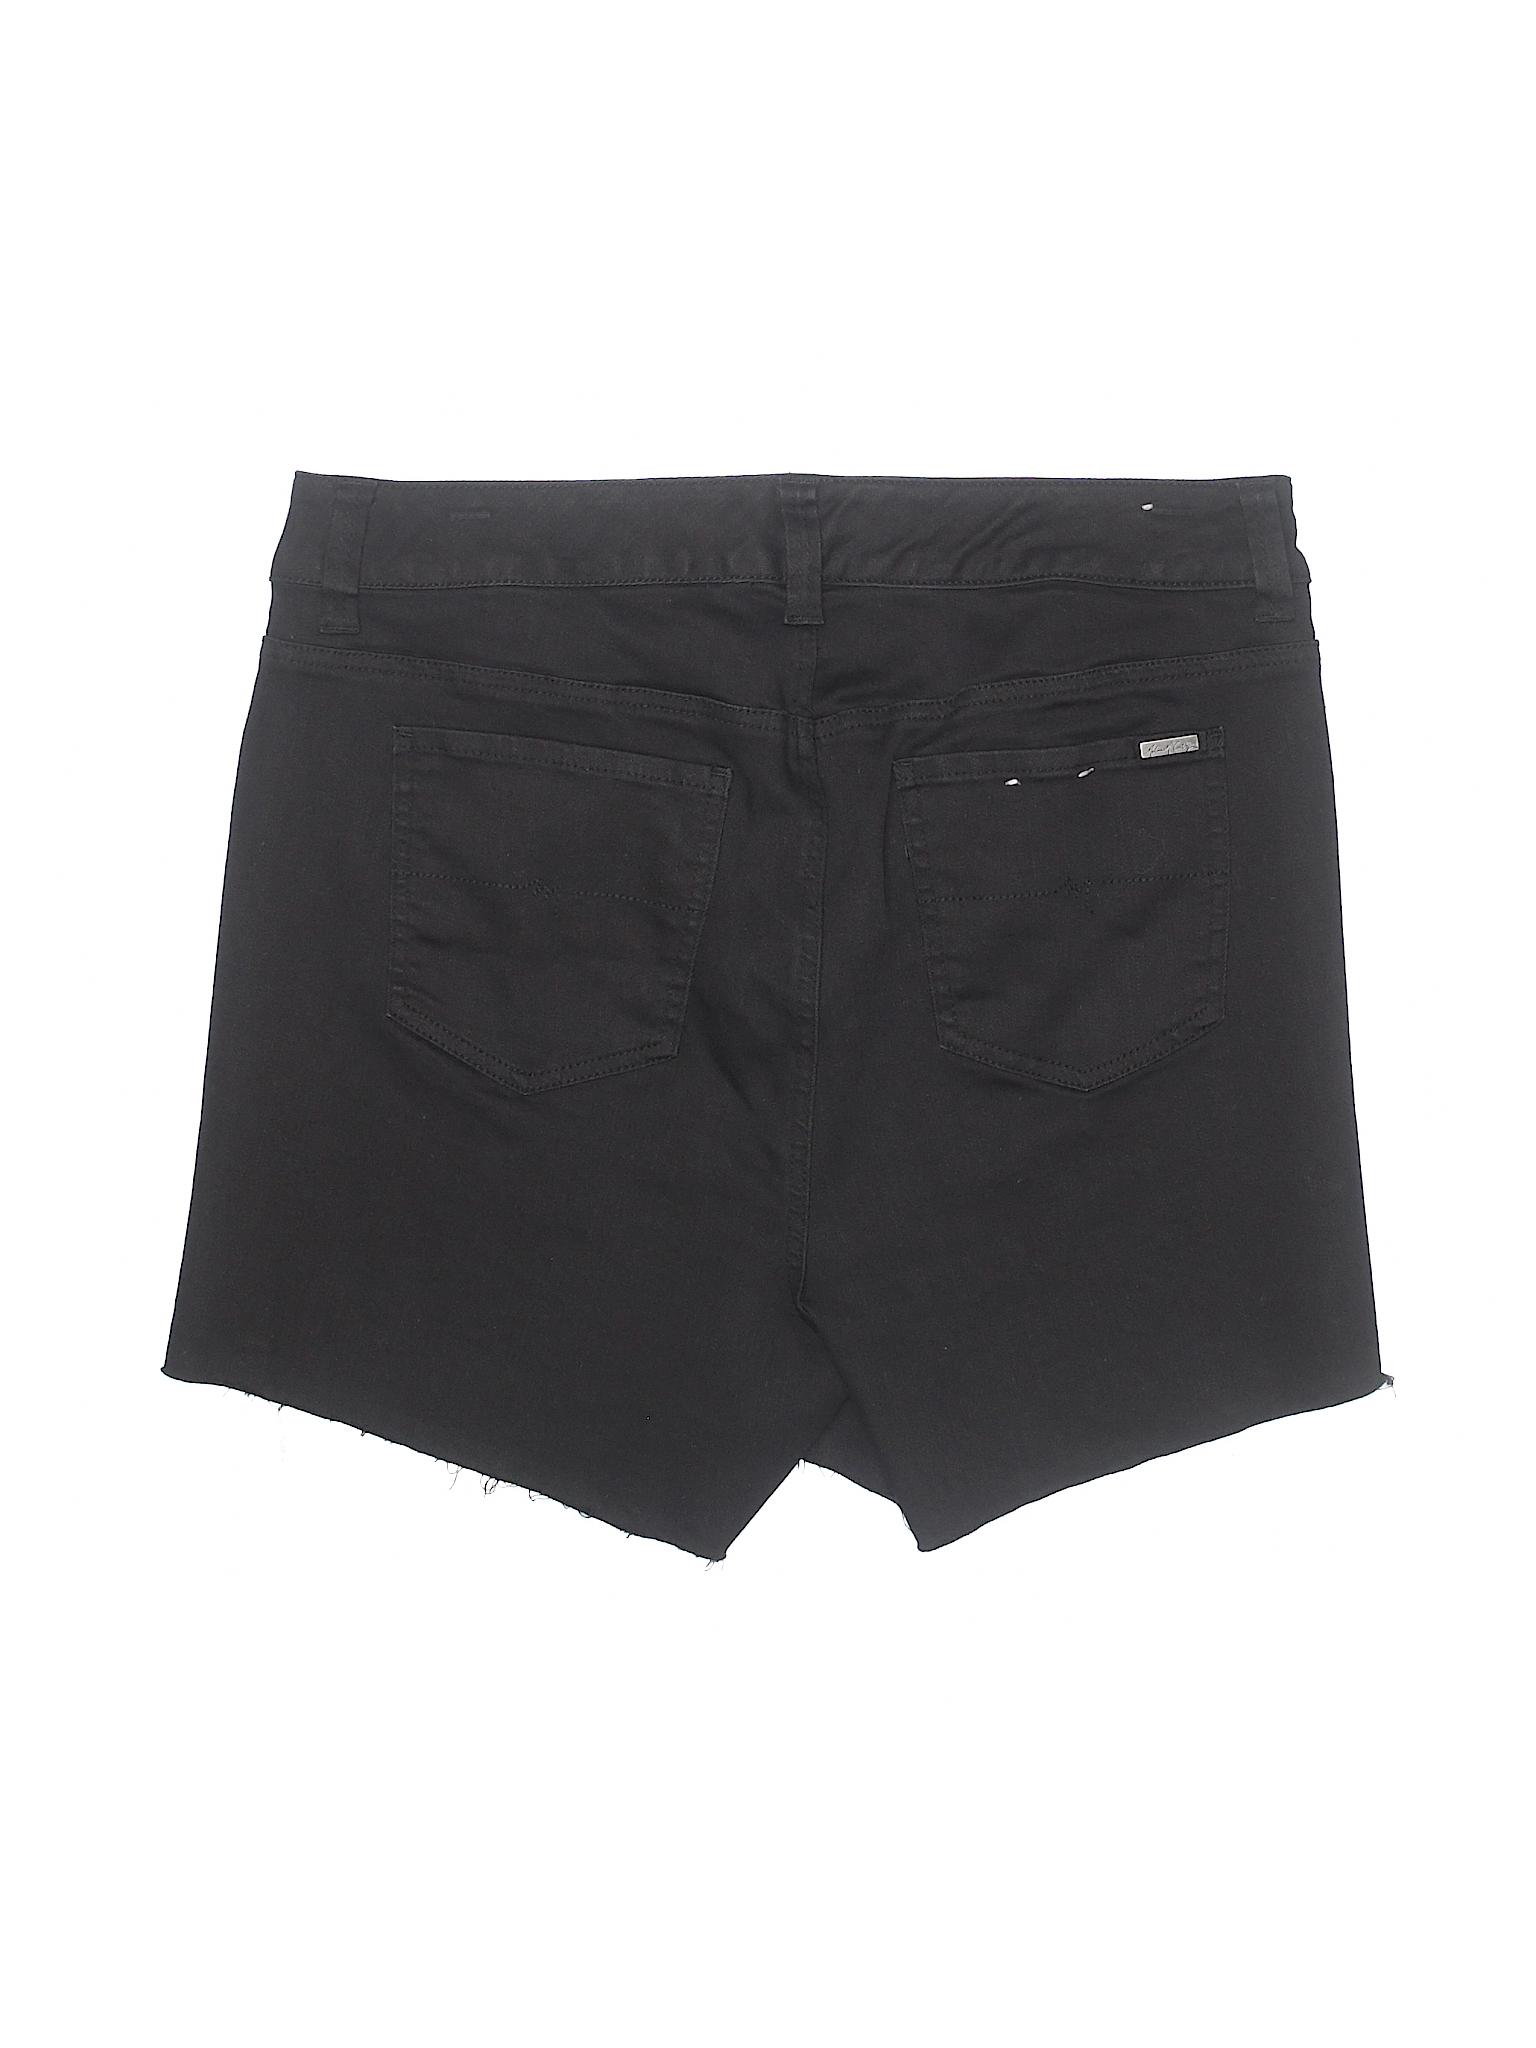 Melissa winter Denim Leisure McCarthy Shorts Seven7 anwx55Rg8